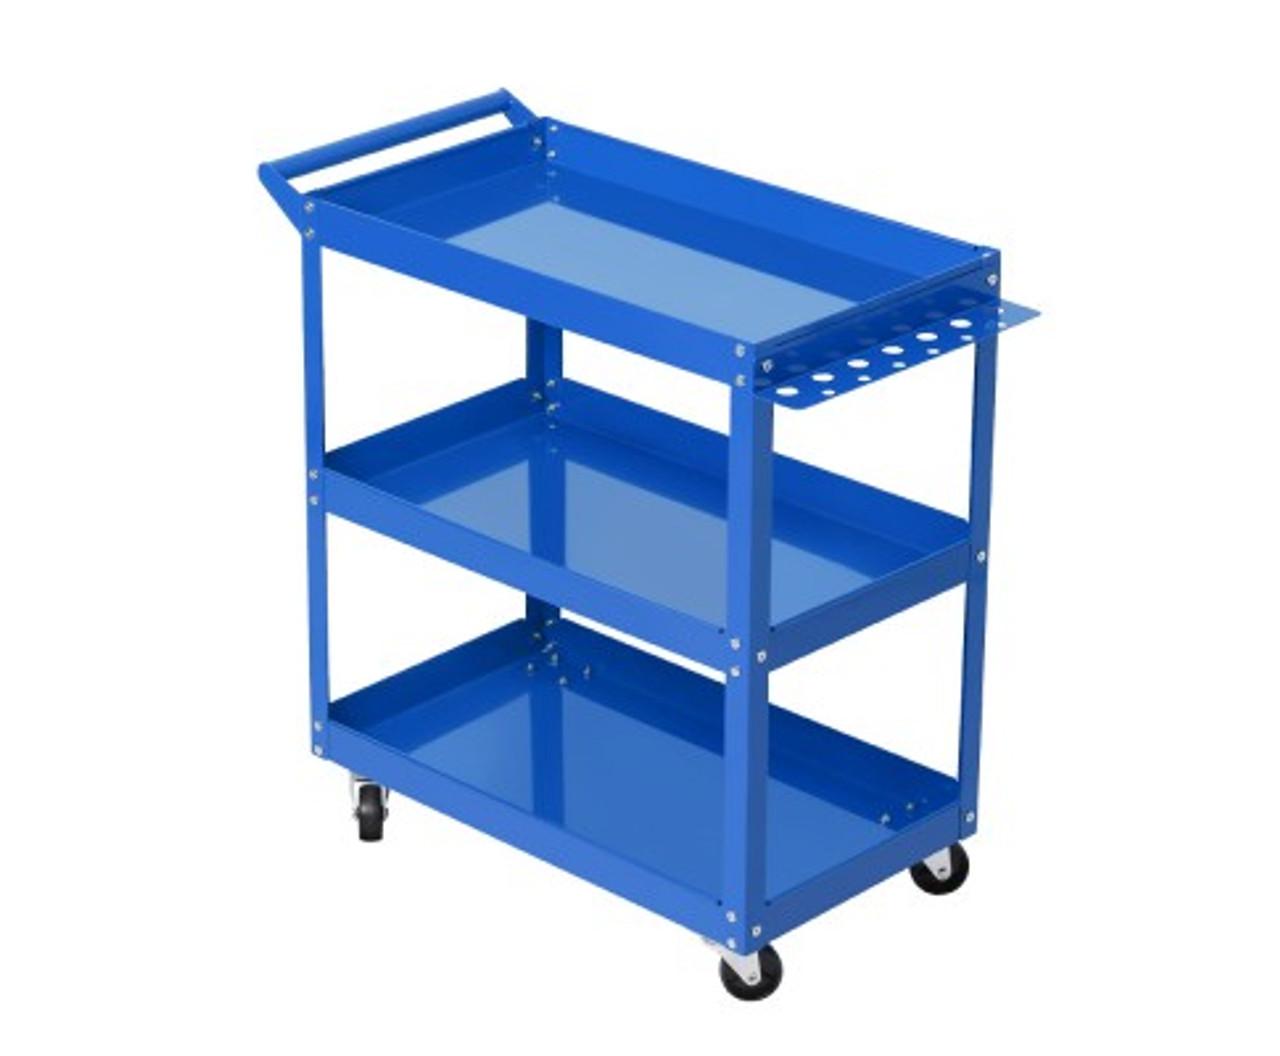 Tool Cart 3 Tier Parts Steel Trolley Mechanic Storage Organizer - Blue